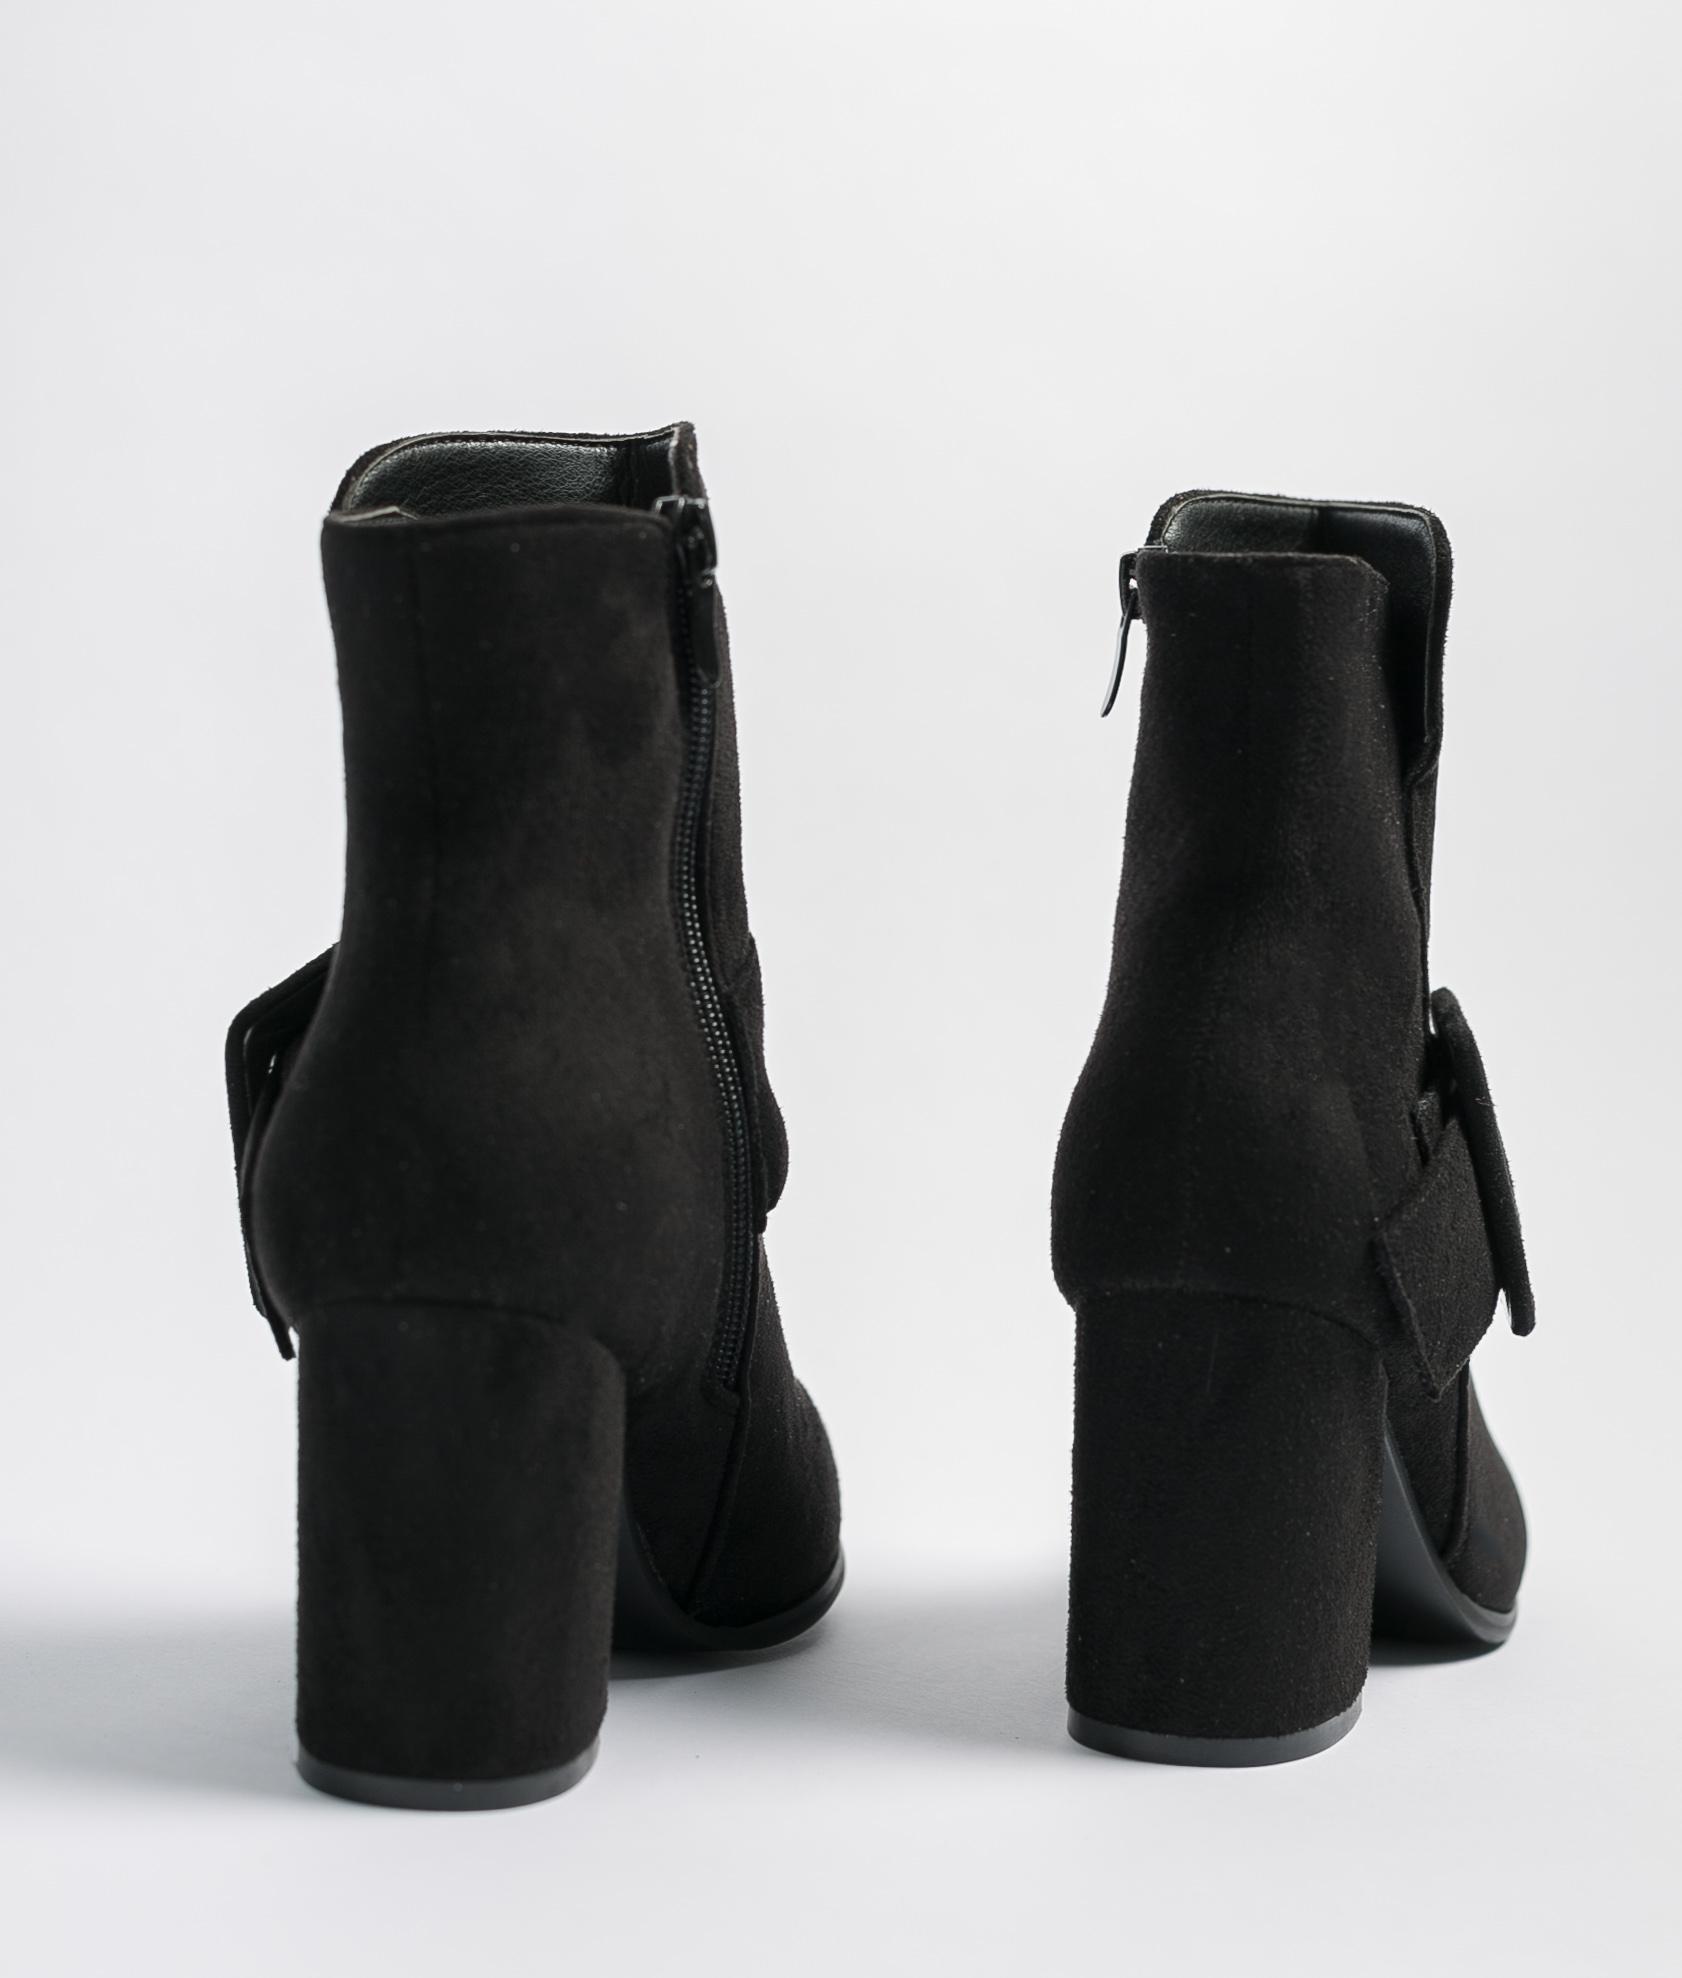 Livana Low Boot - Black